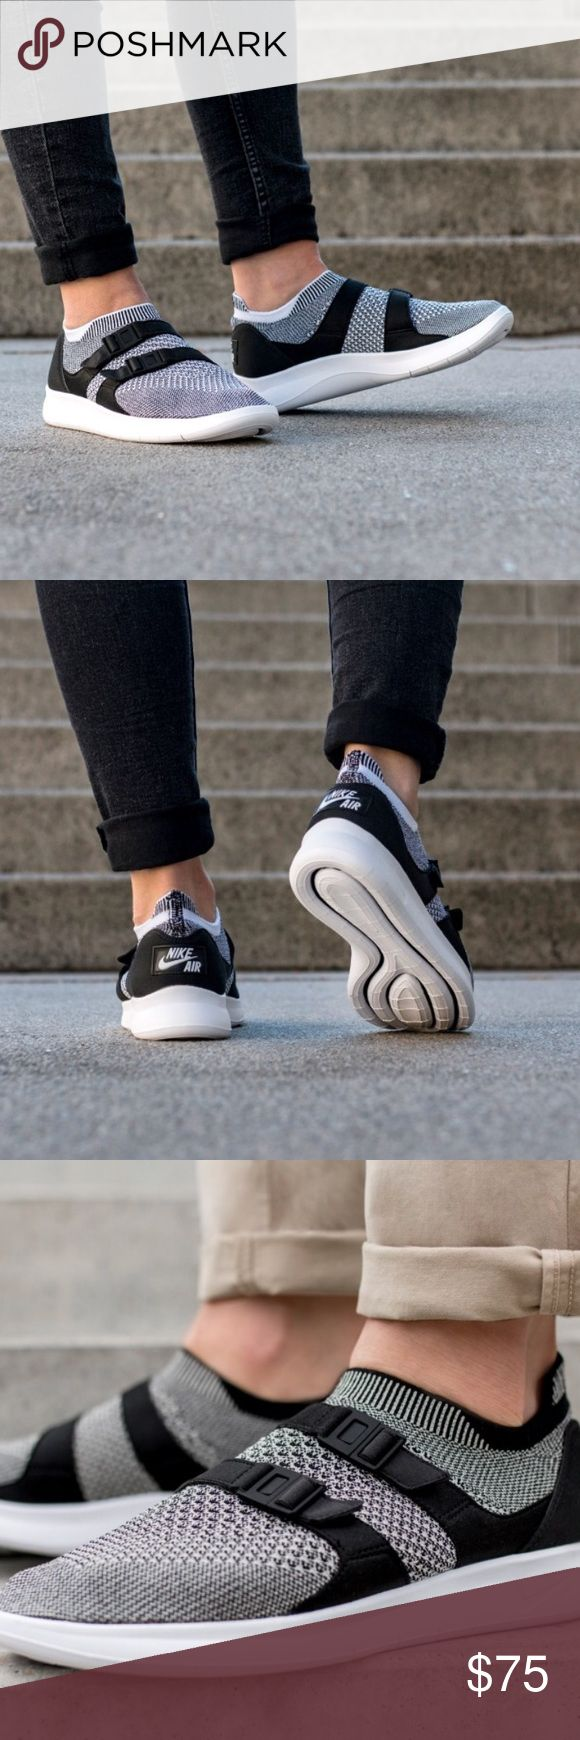 Nike air sockracer flyknit NWT